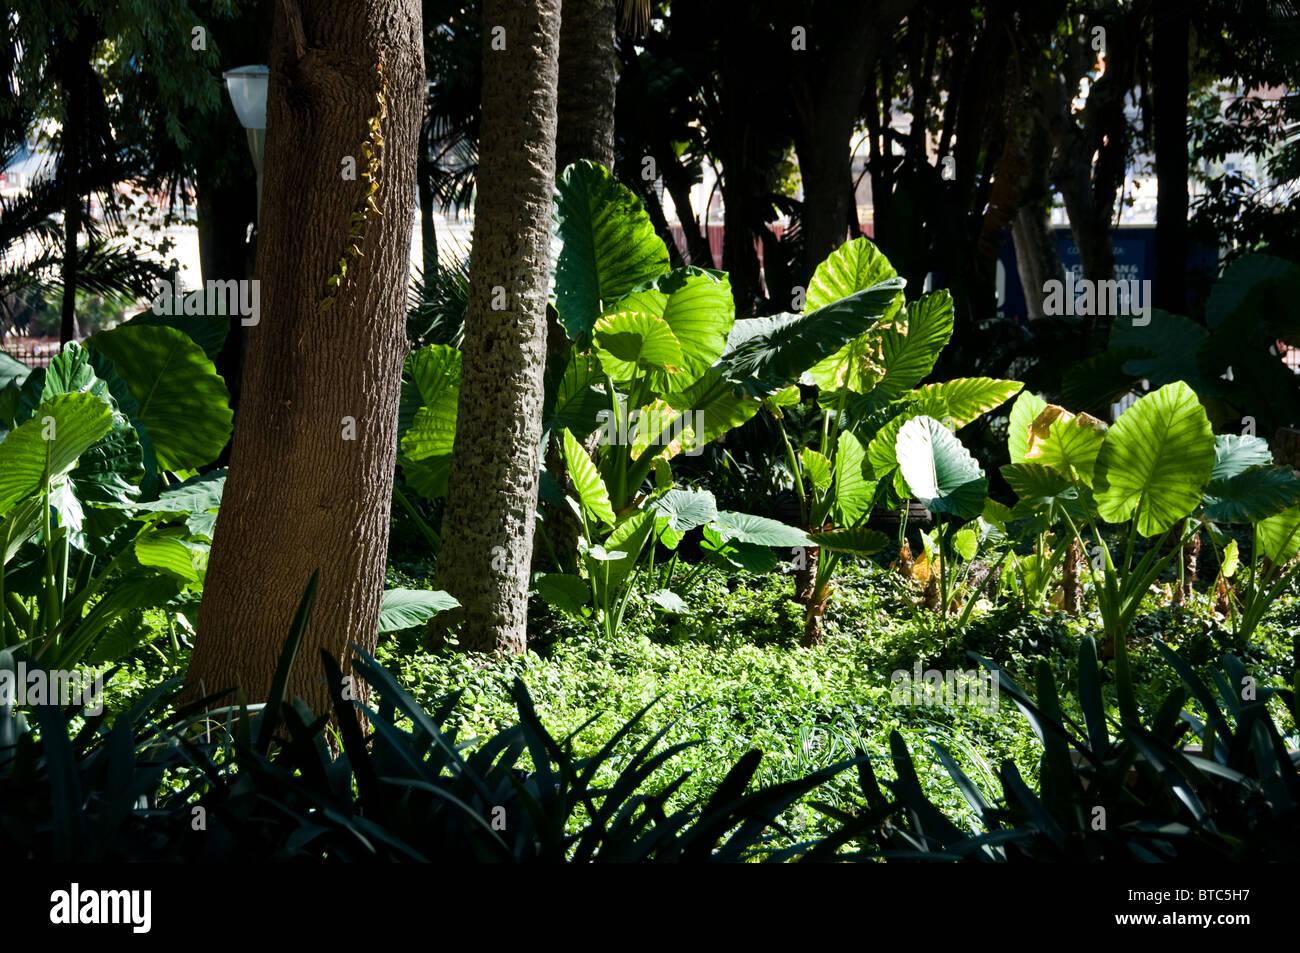 Spain Andalusia Malaga Park Garden Sea Front trees - Stock Image